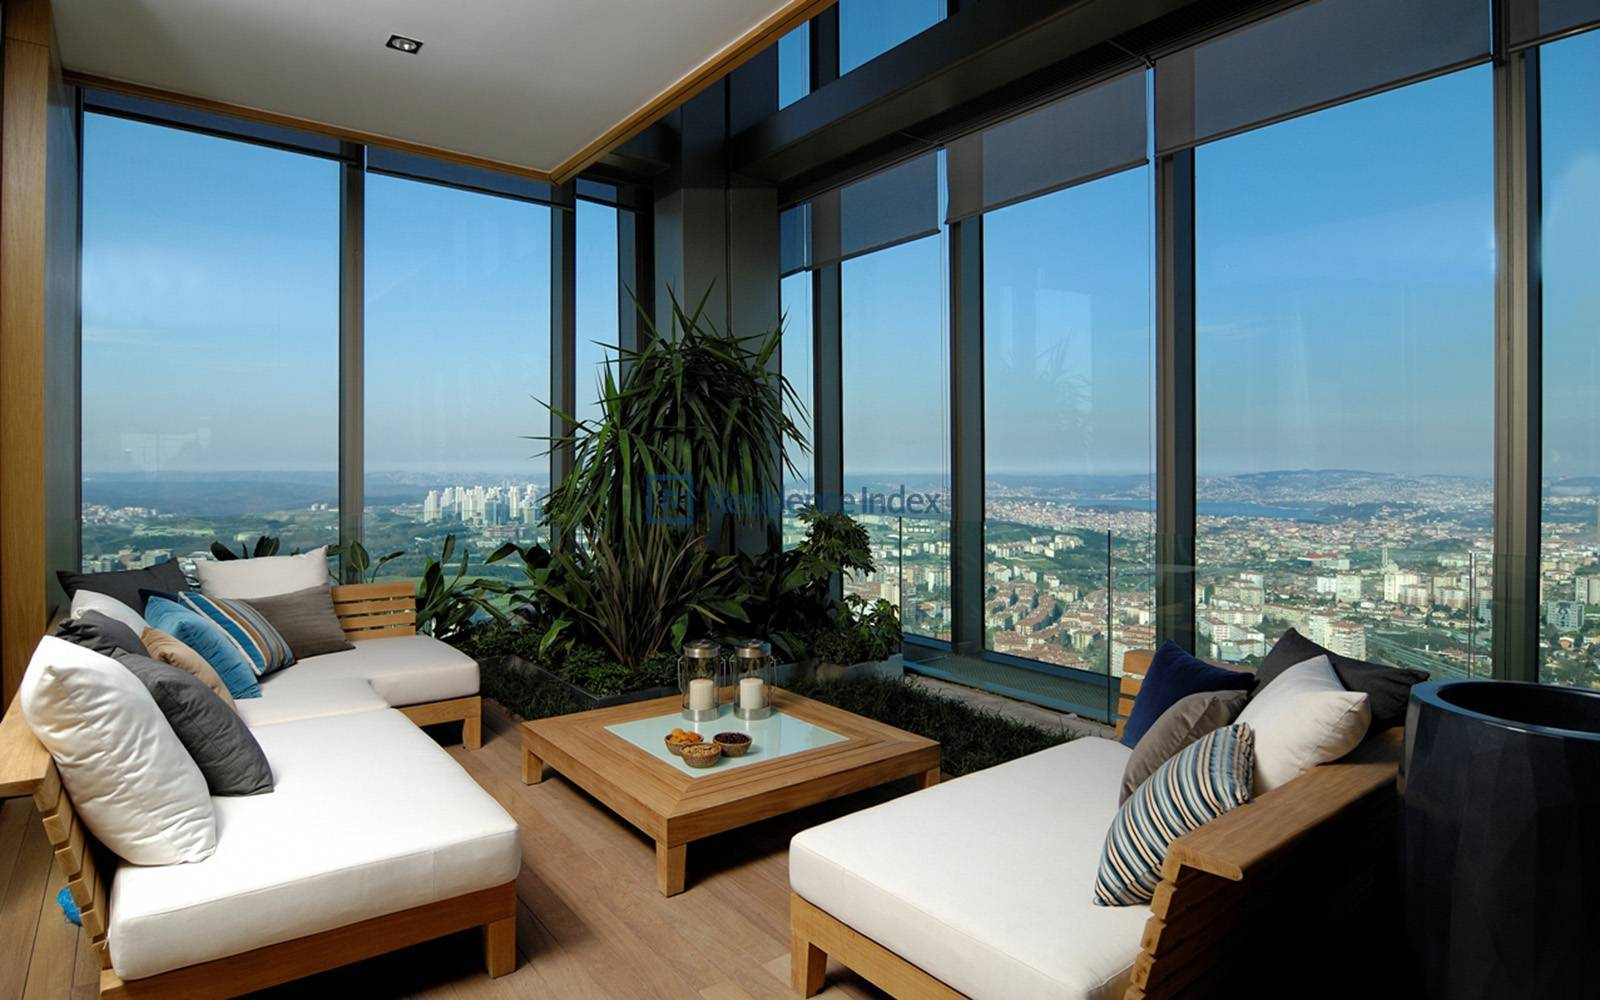 Sapphire Residence - Bosphorus View, Luxury 3 + 1 Residence For Rent